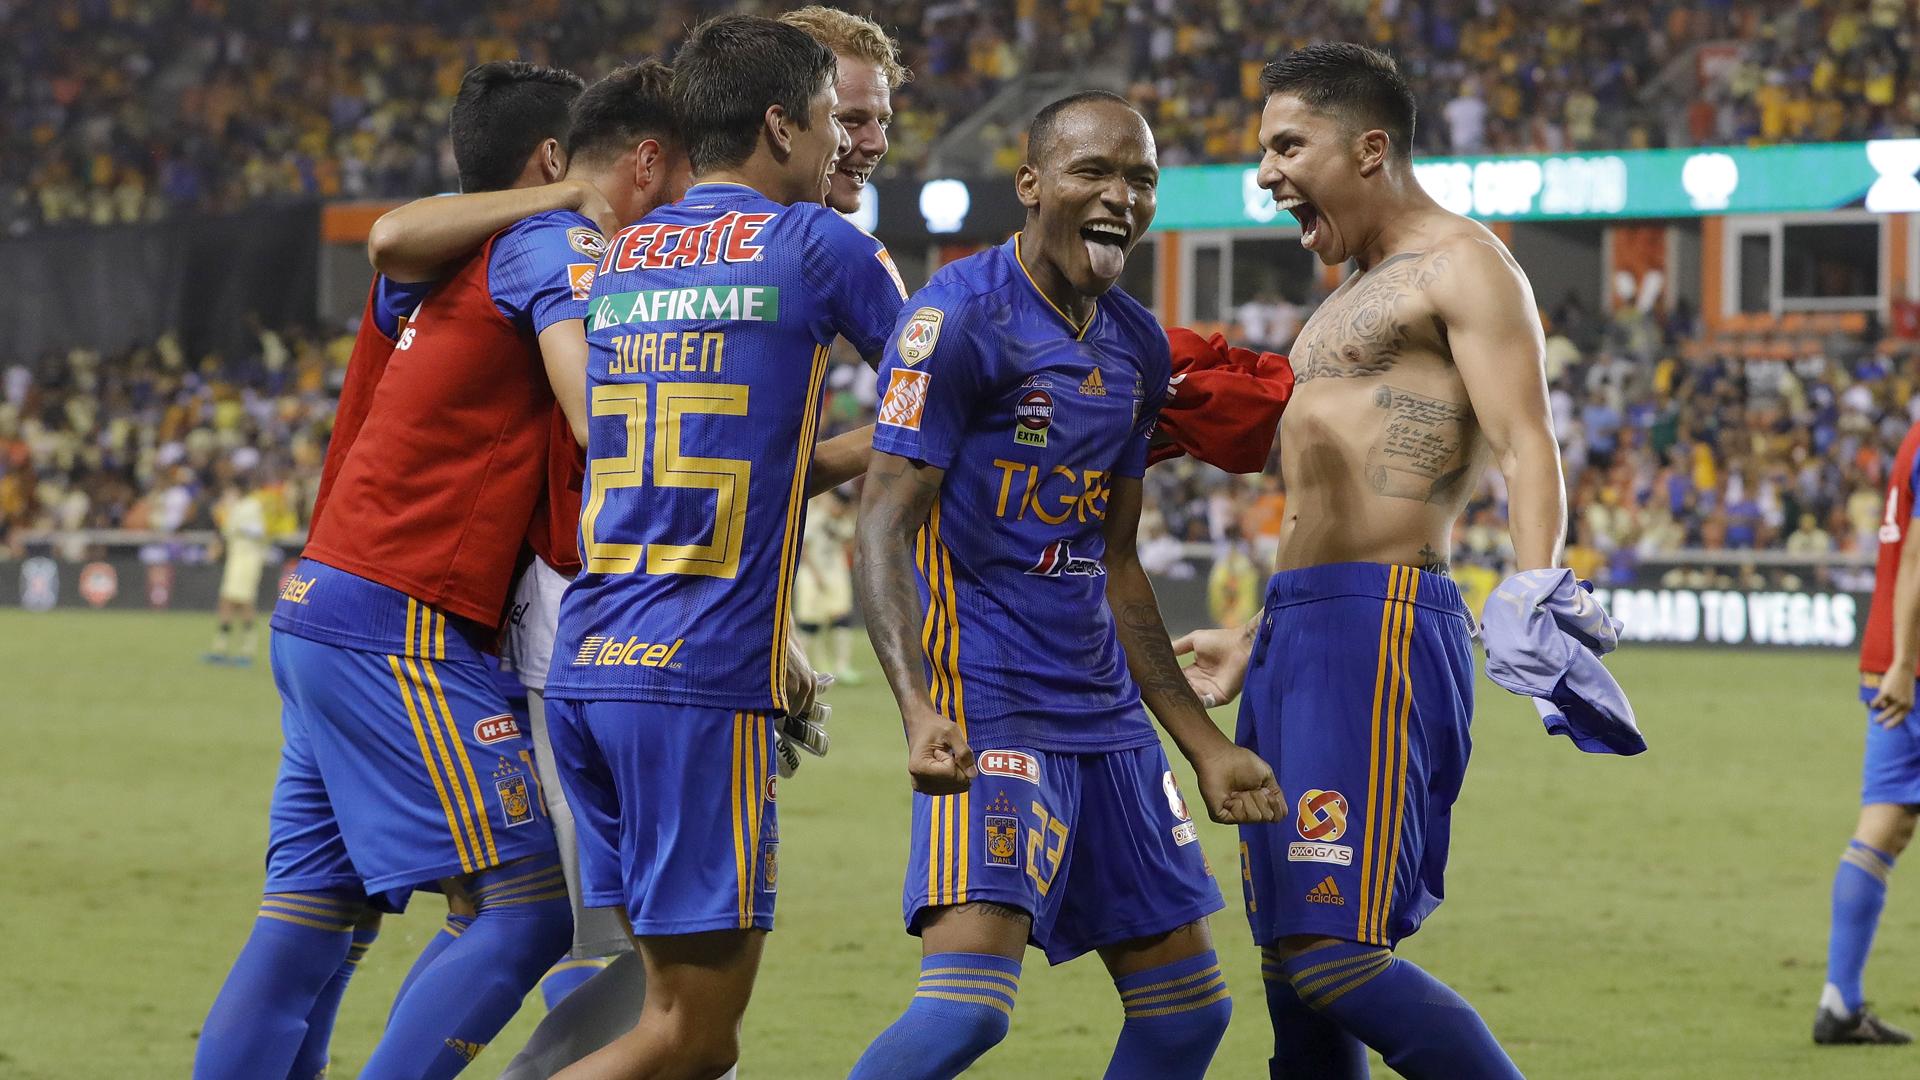 Leagues Cup Review: Tigres UANL, Cruz Azul to meet in final